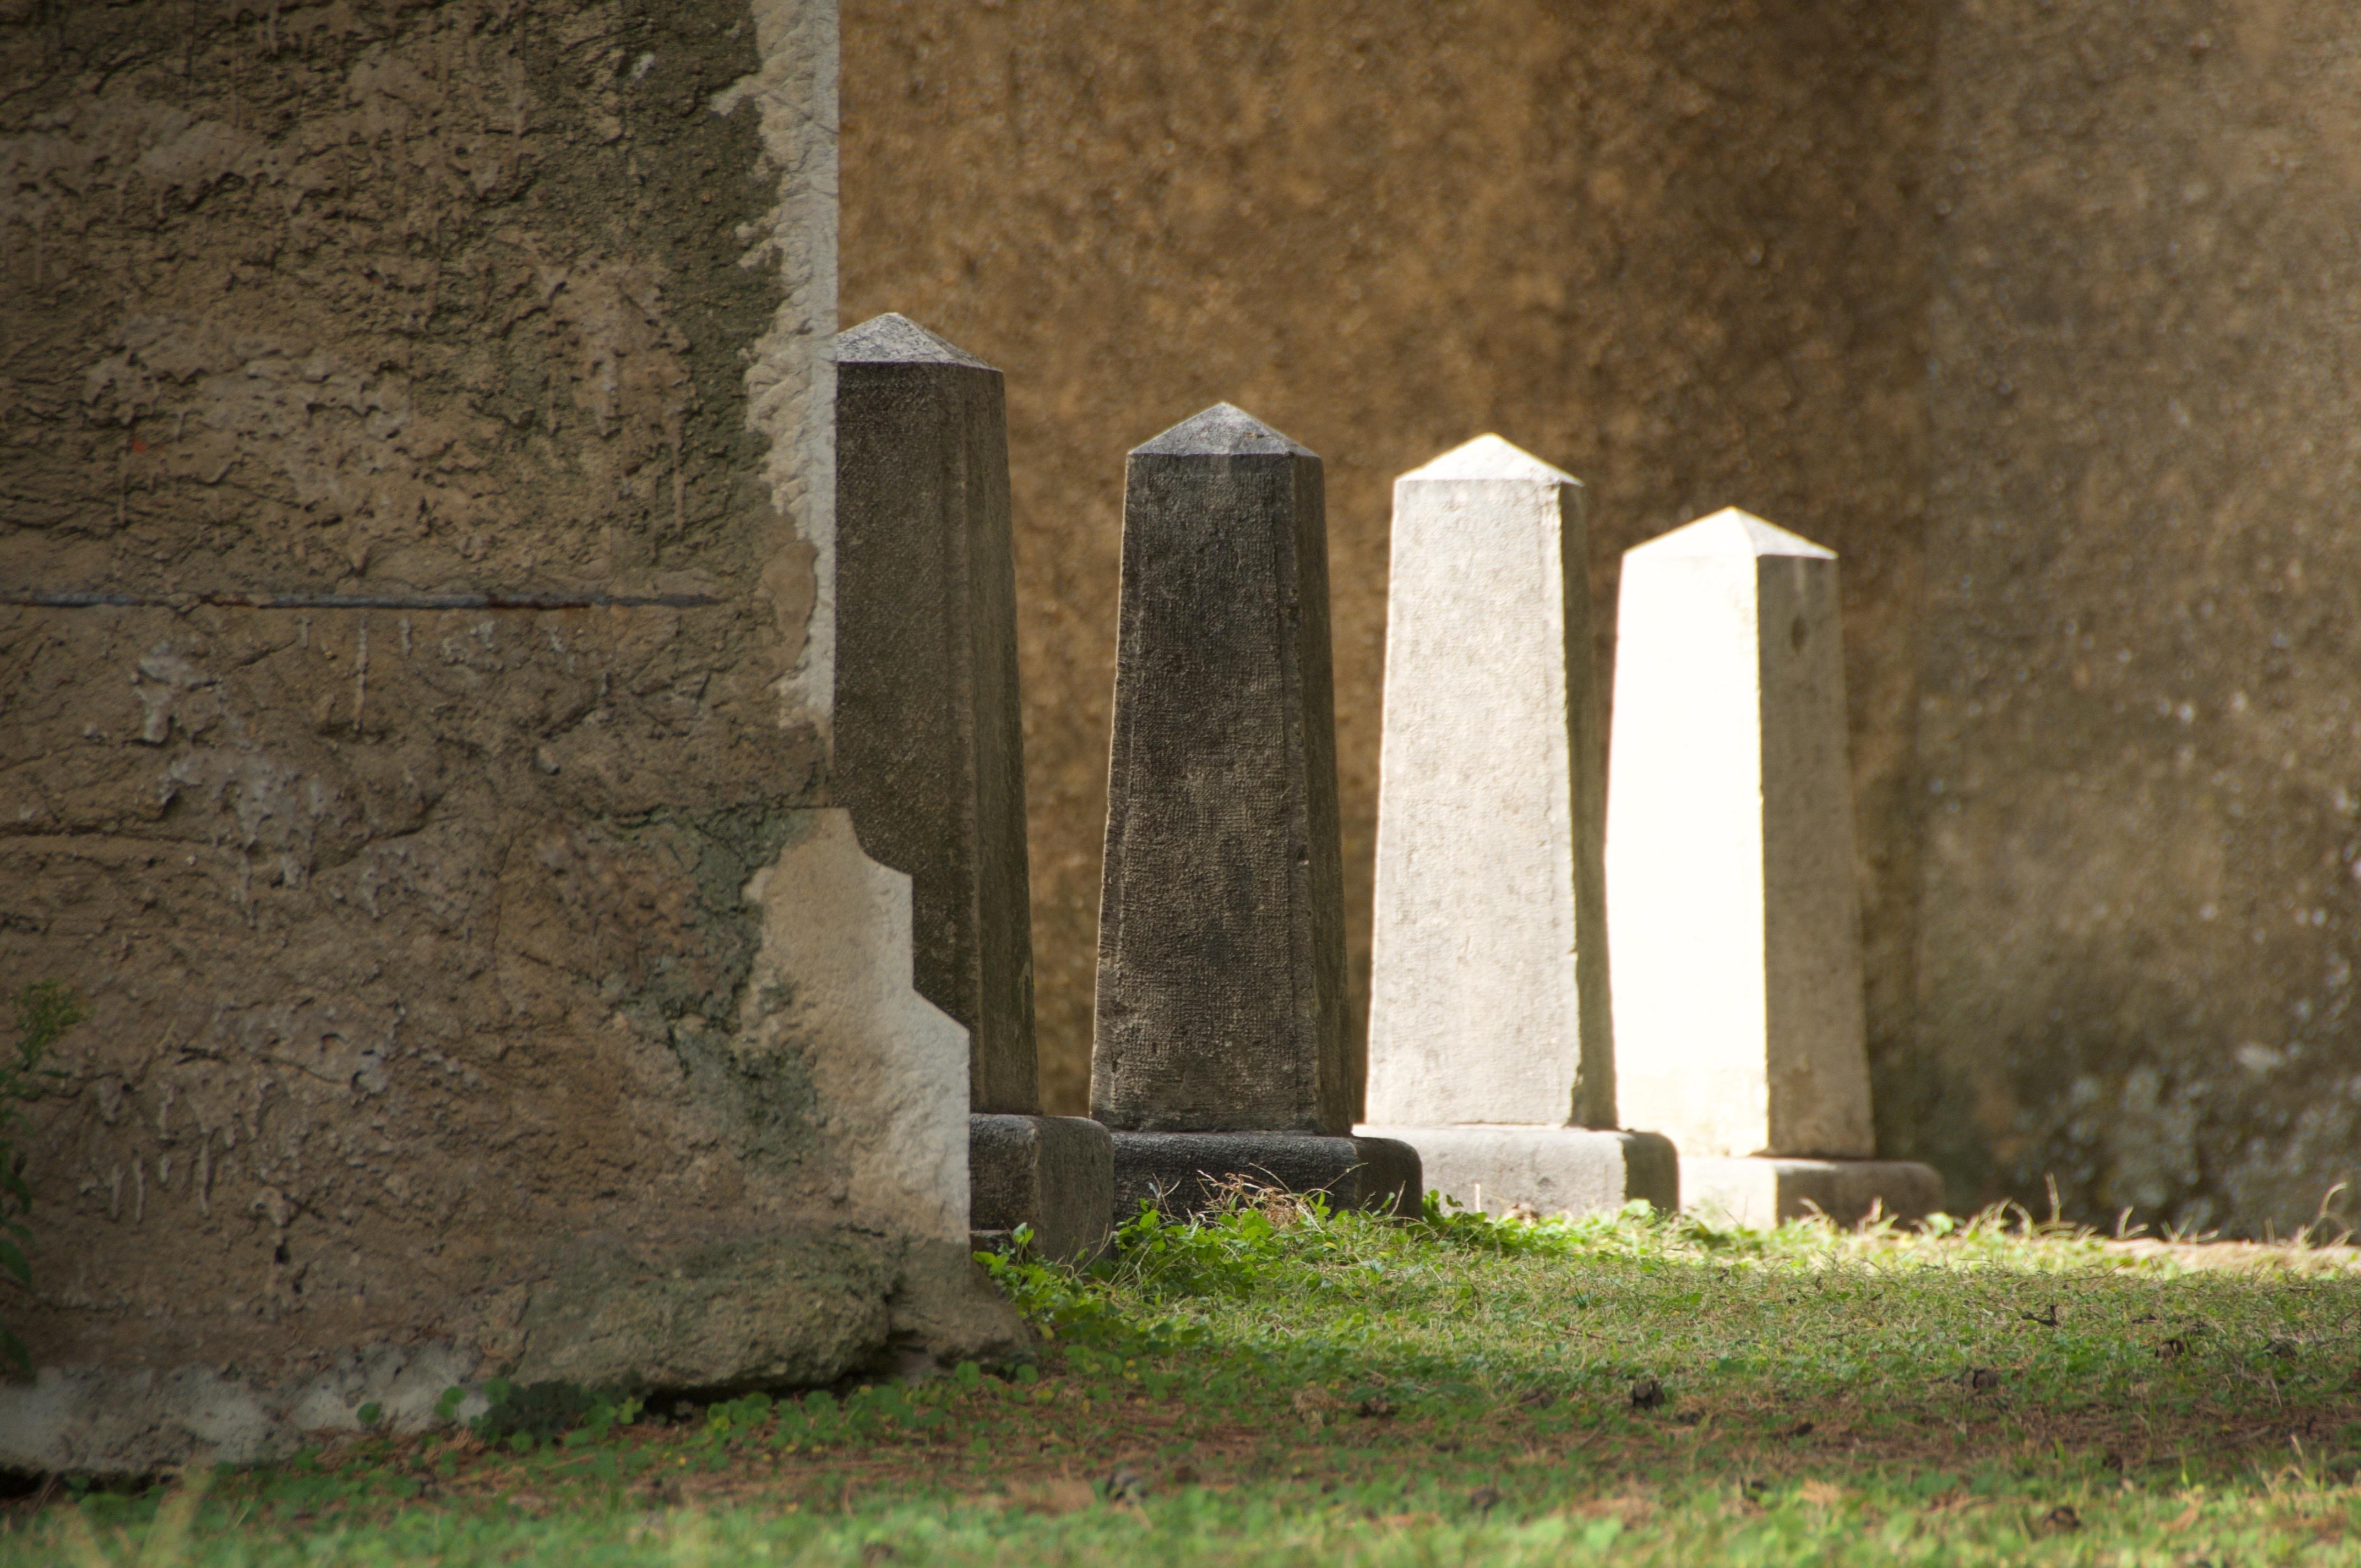 Gravestoneshq Definitive Guide To Choosing A Gravestone